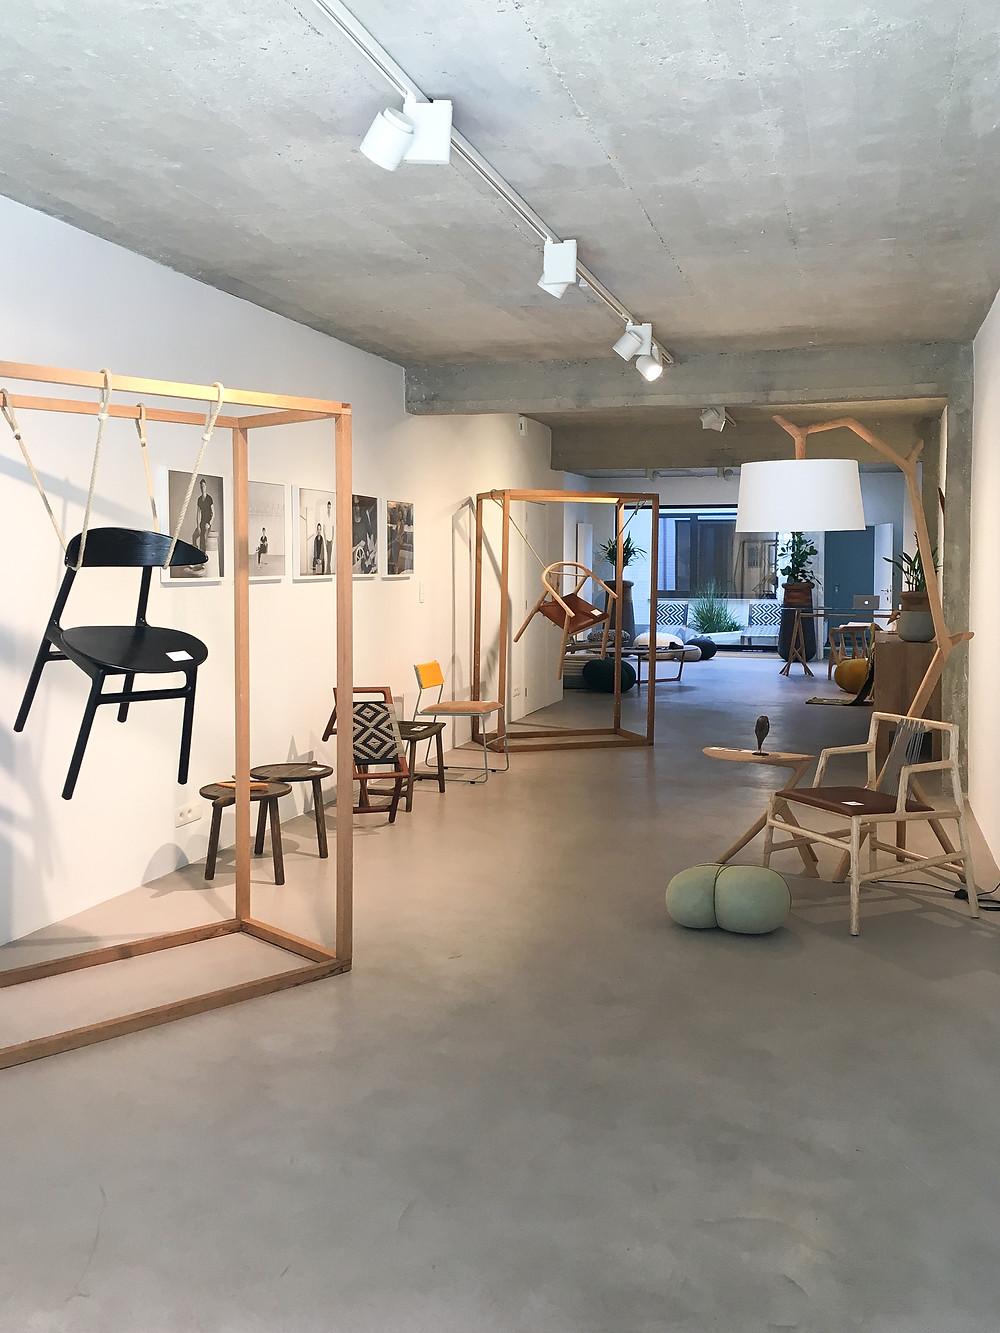 exhibition, antwerp, south african design, furniture, showcase, mimic, planters, decor, lighting